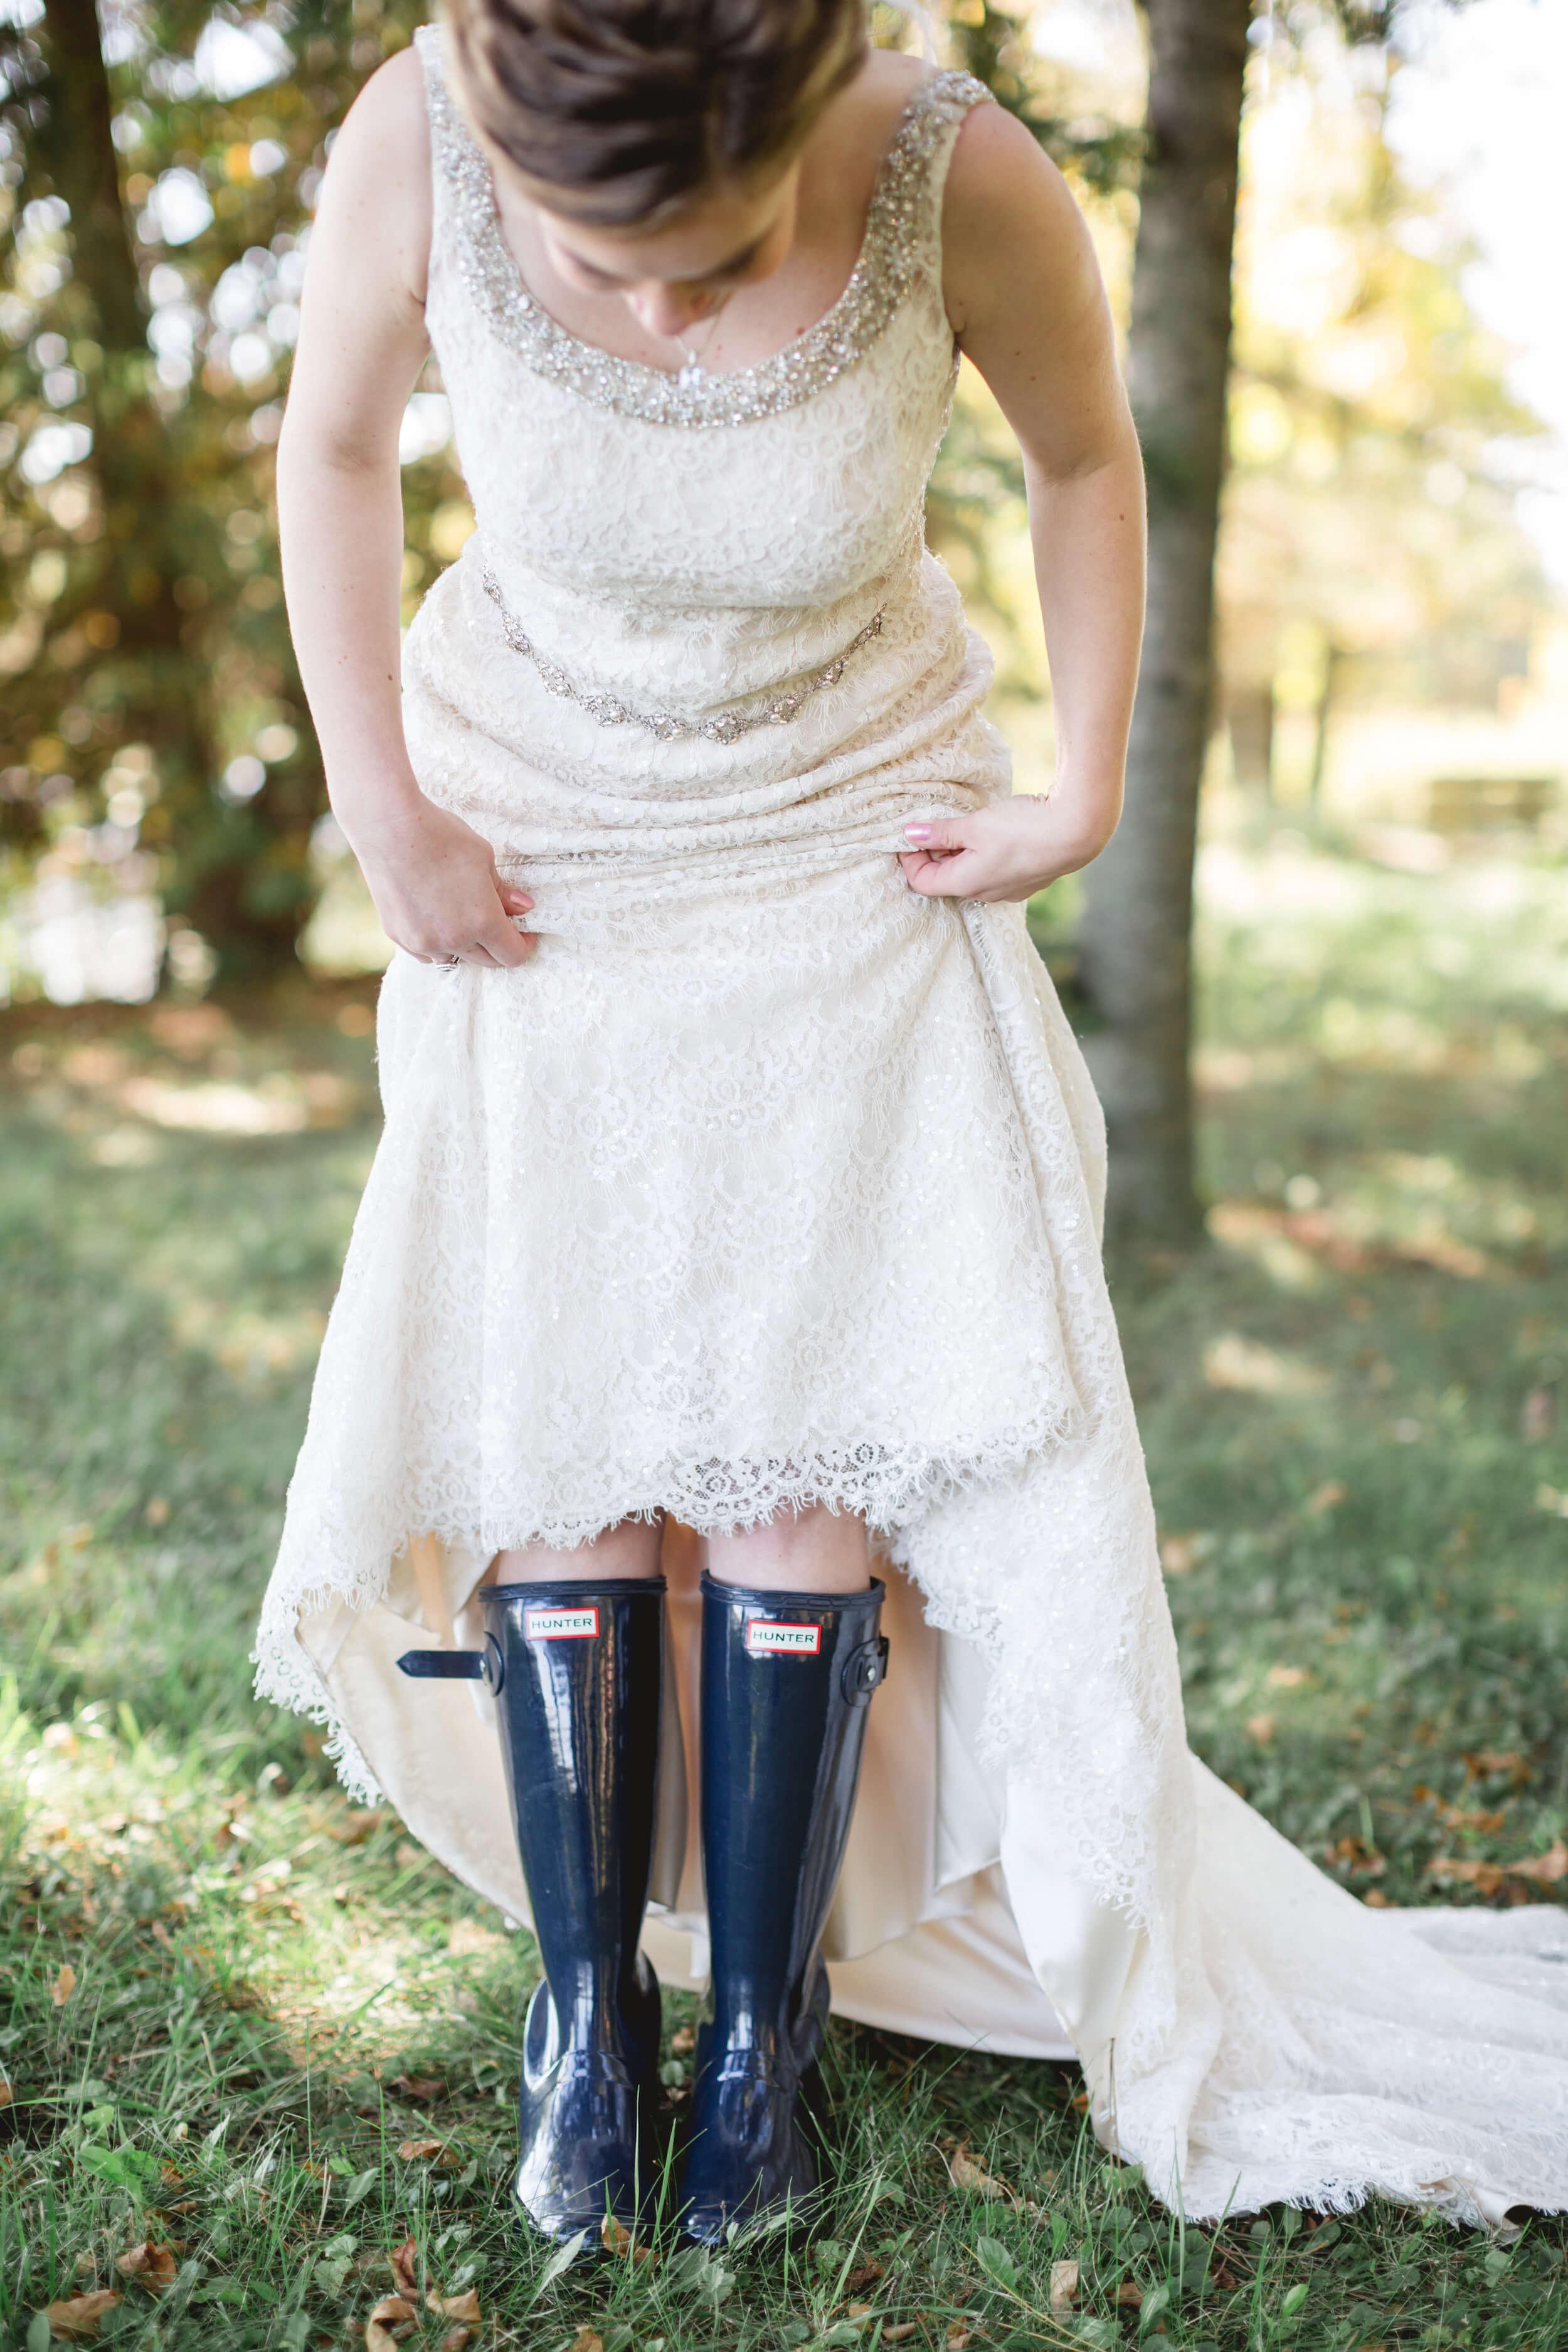 rochelle-louise-photography-acowsay-cinema-wisconsin-wedding-31.jpg